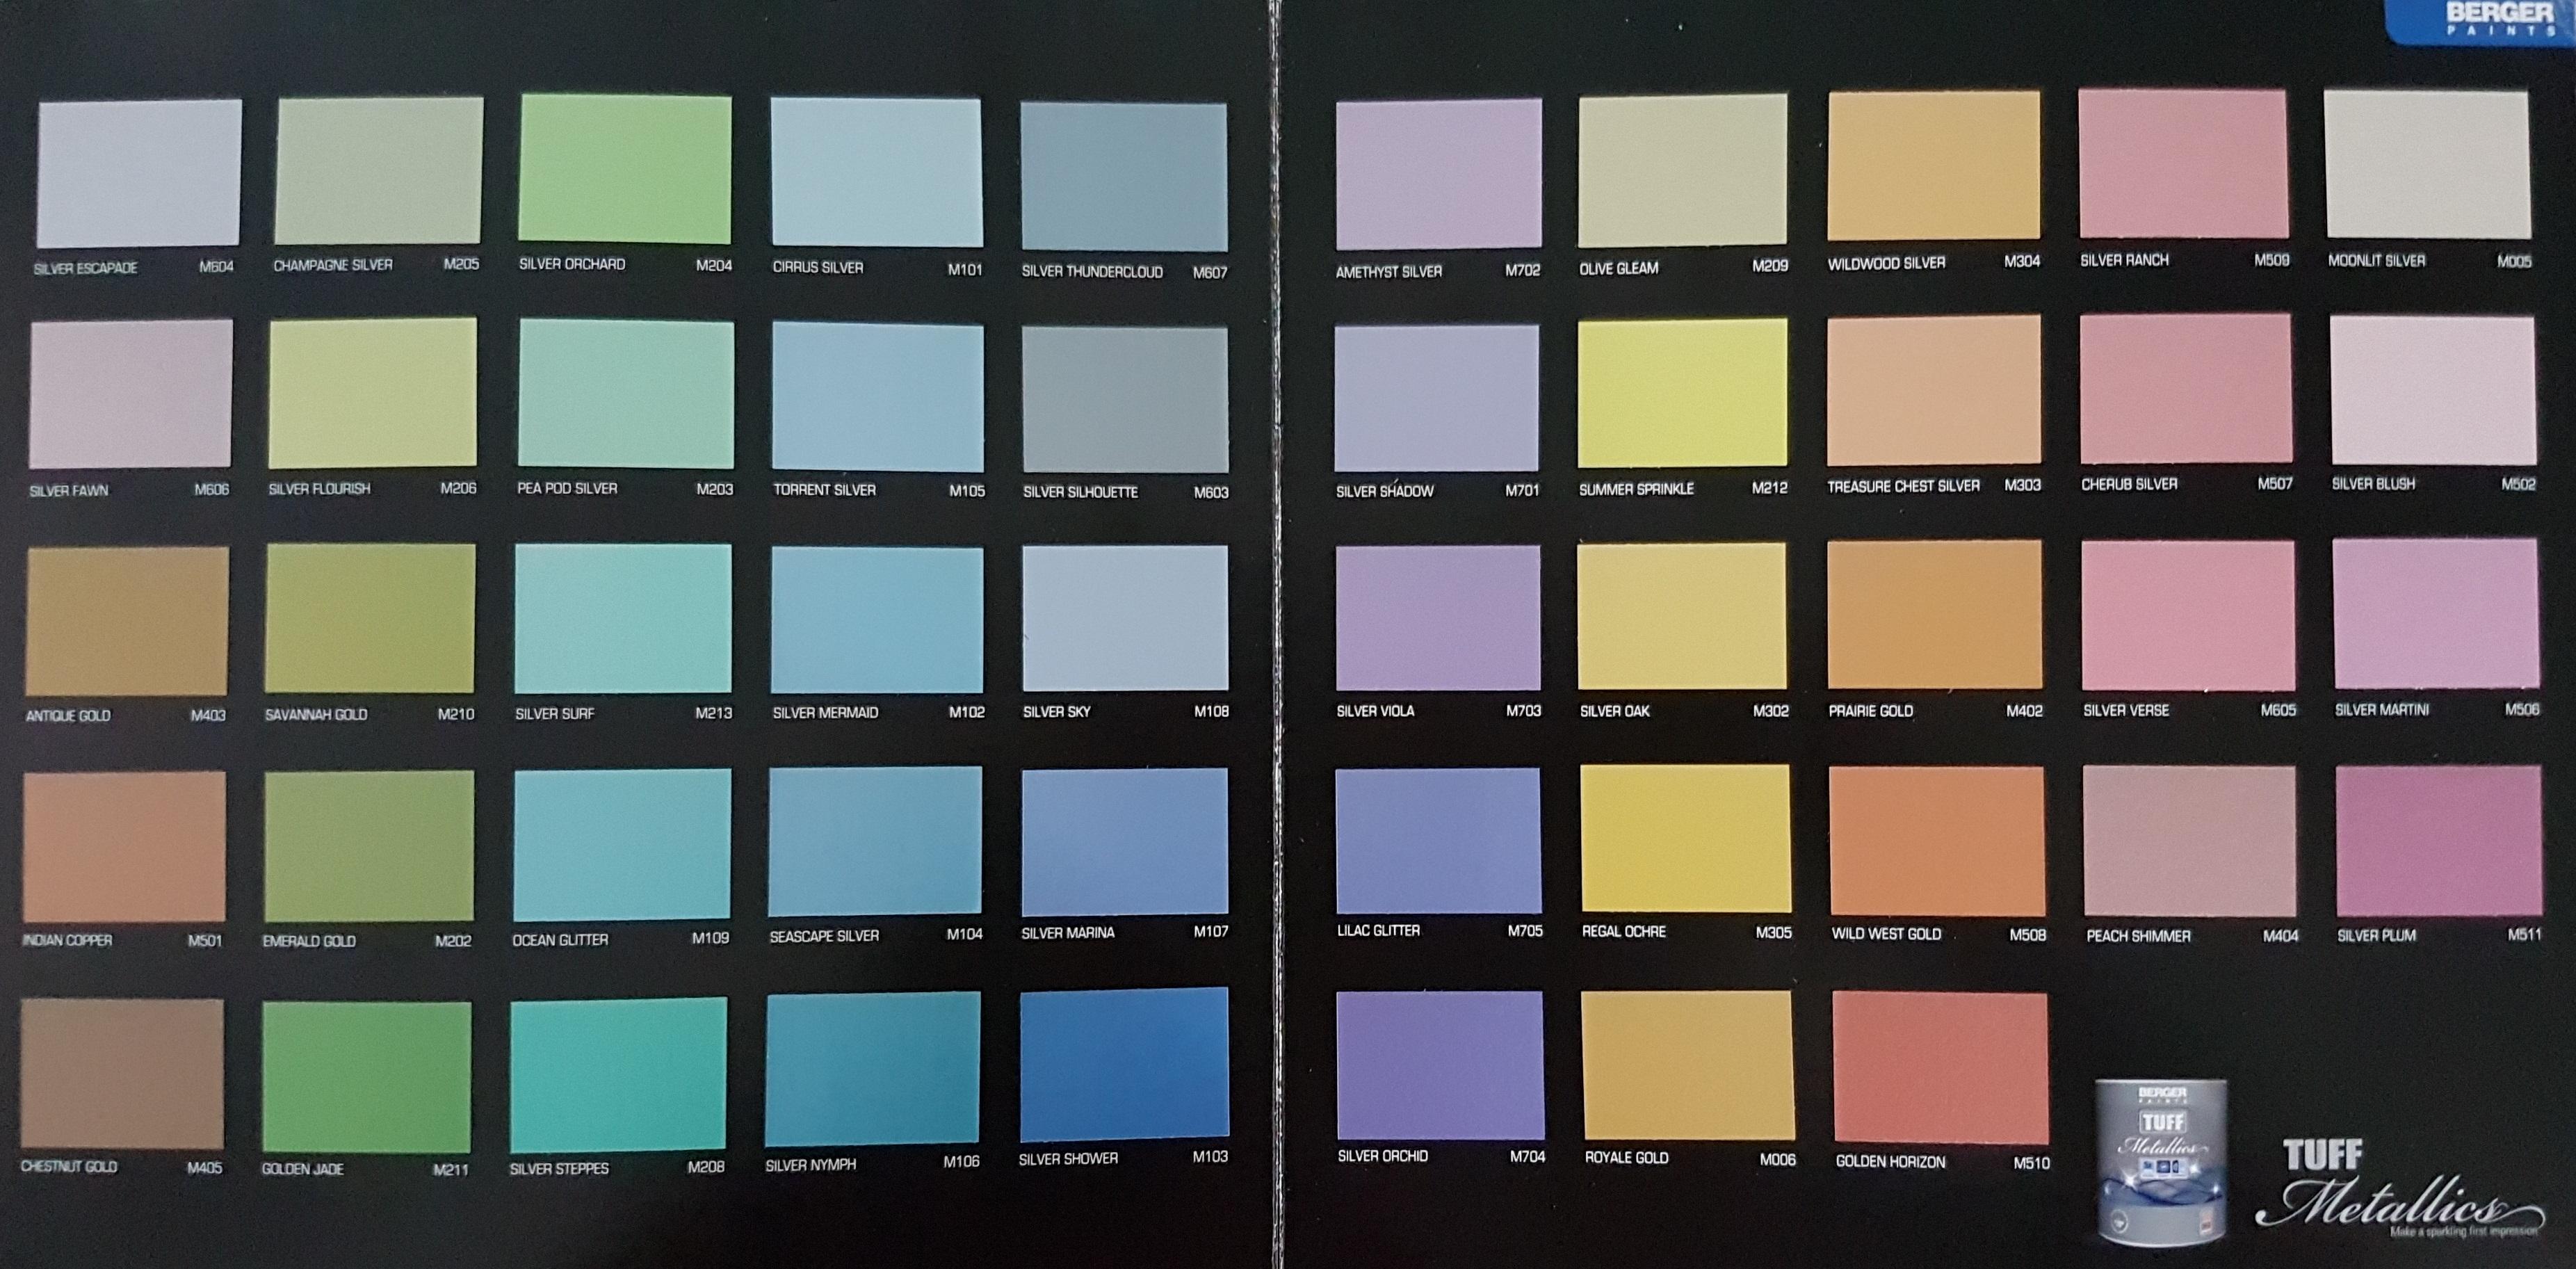 Berger Paints Colour Shades With Names Of - Paint Color Ideas